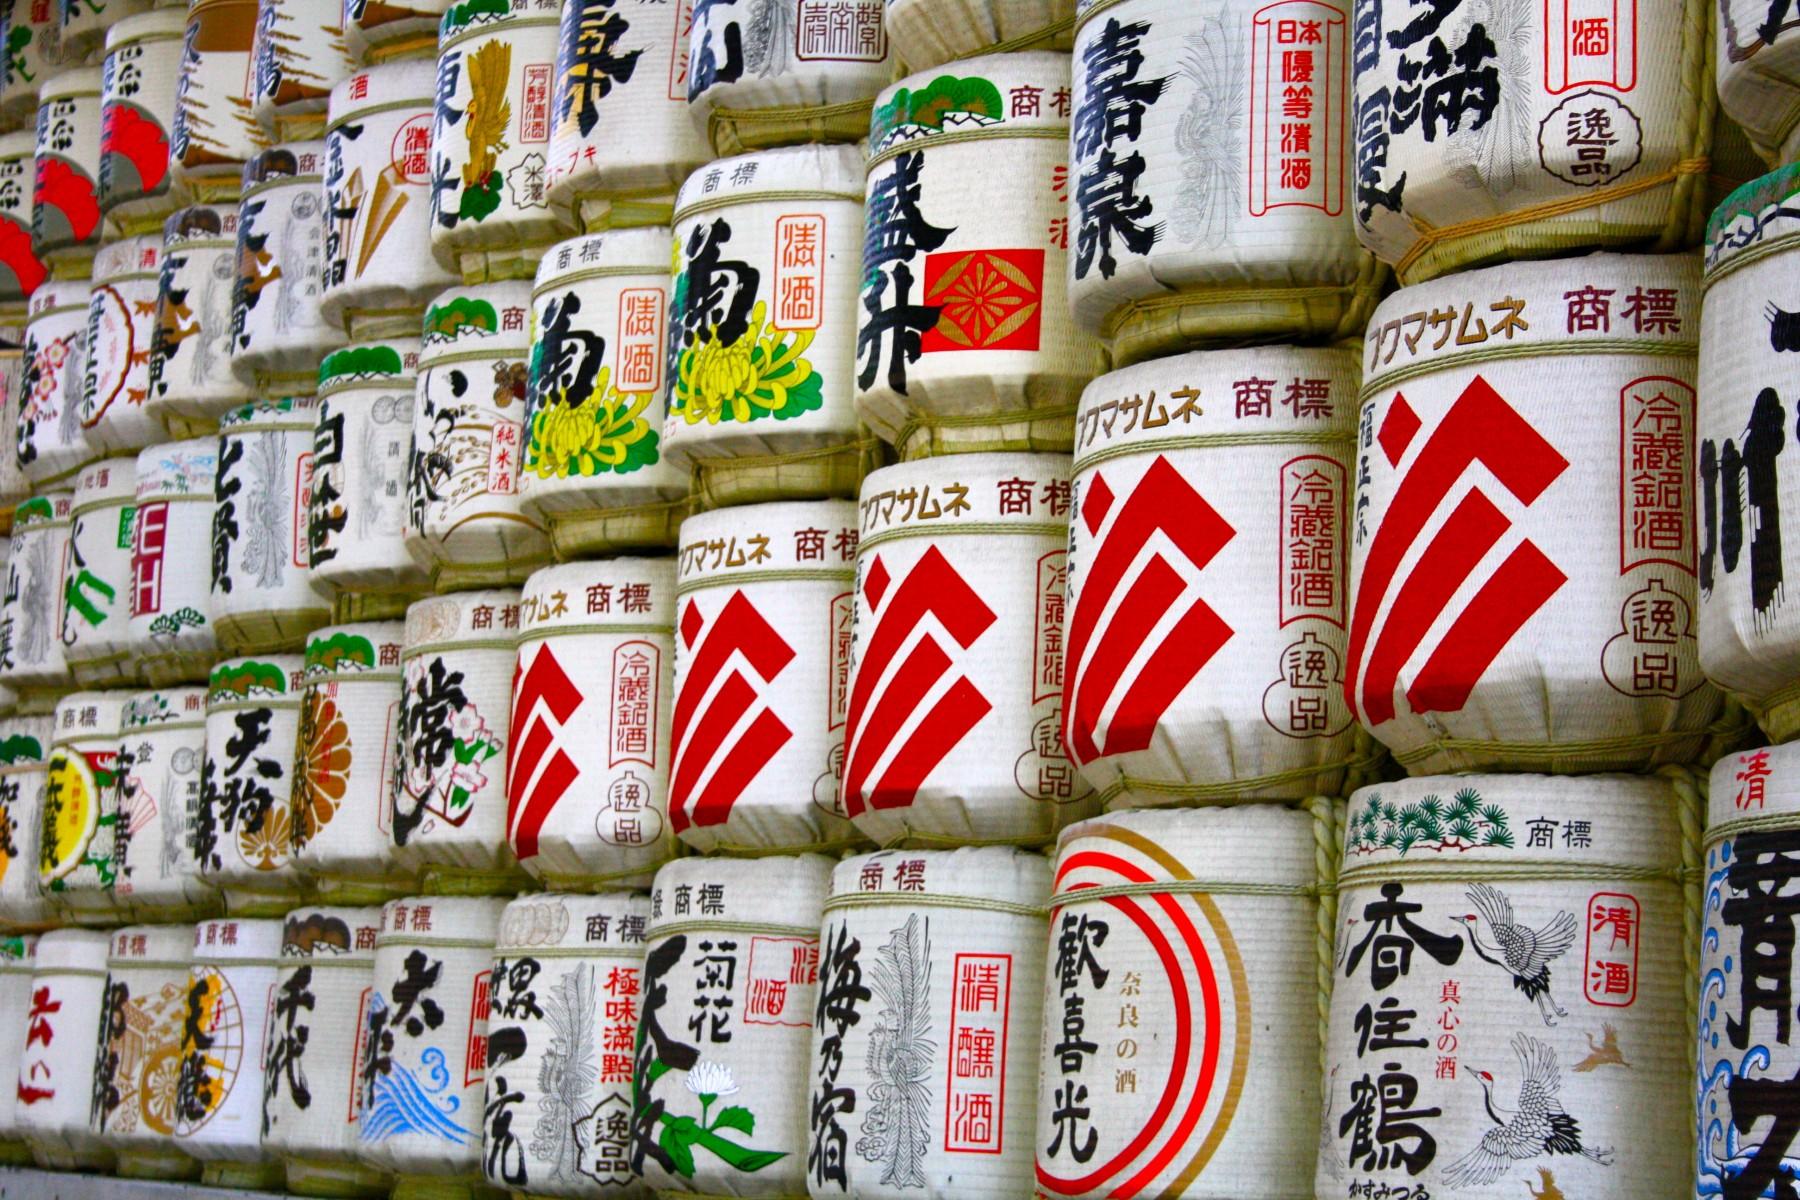 Barili di Sake al santuario Meiji di Tokyo